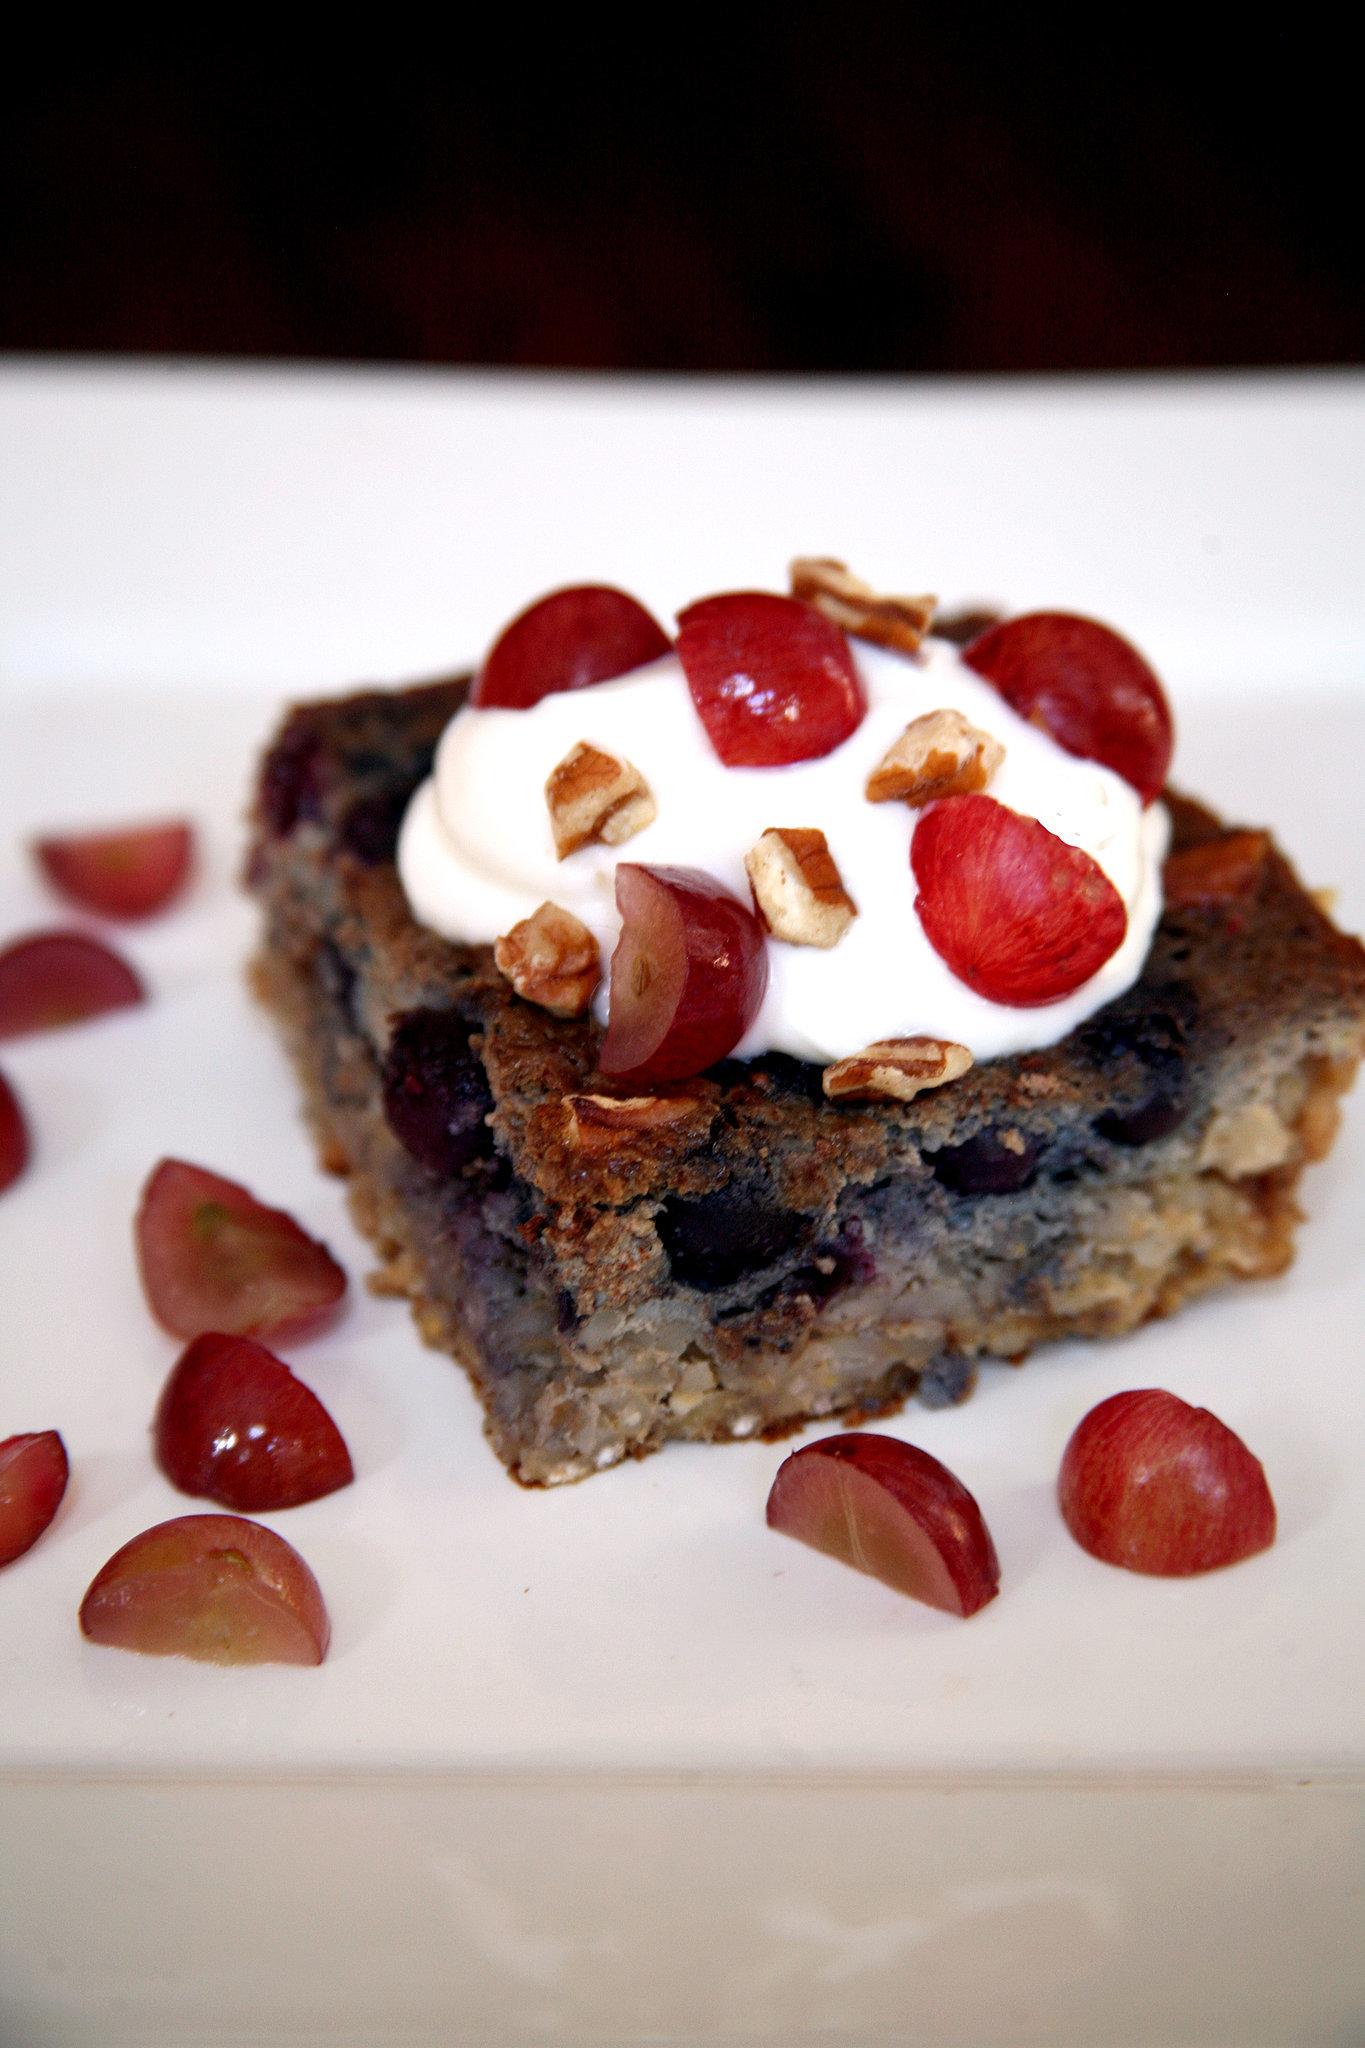 Blueberry-Grape Barley Bake